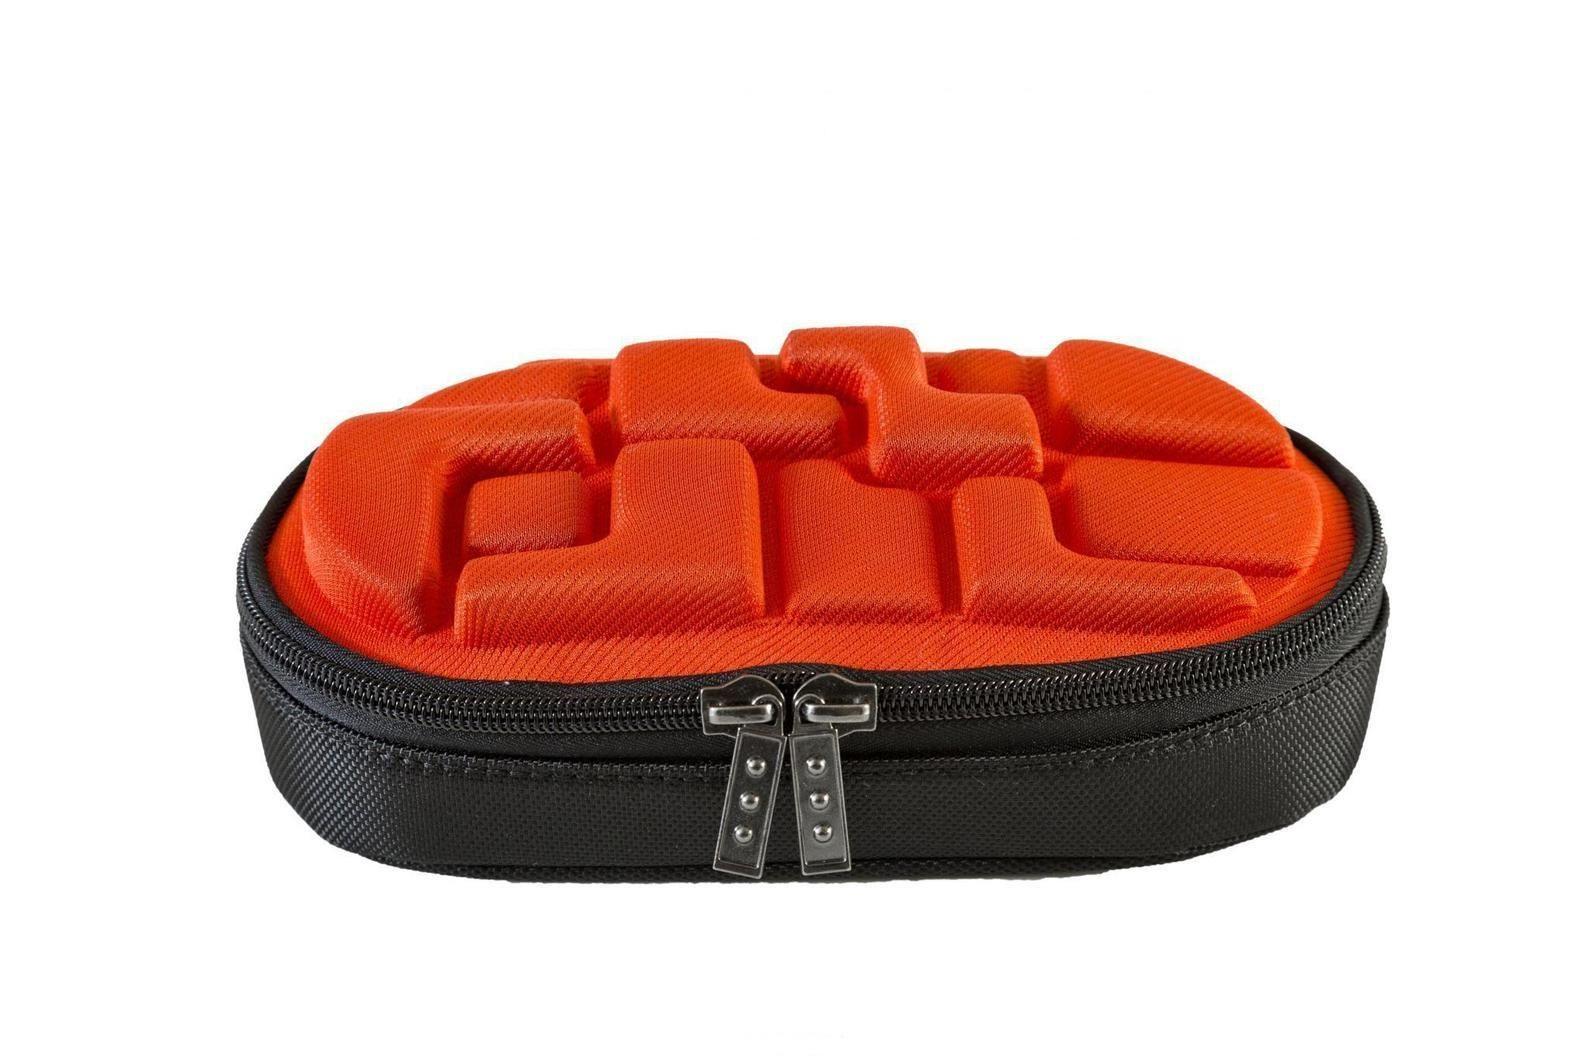 Пенал LedLox Pencil Case, цвет оранжевый - Пеналы, артикул: 169332